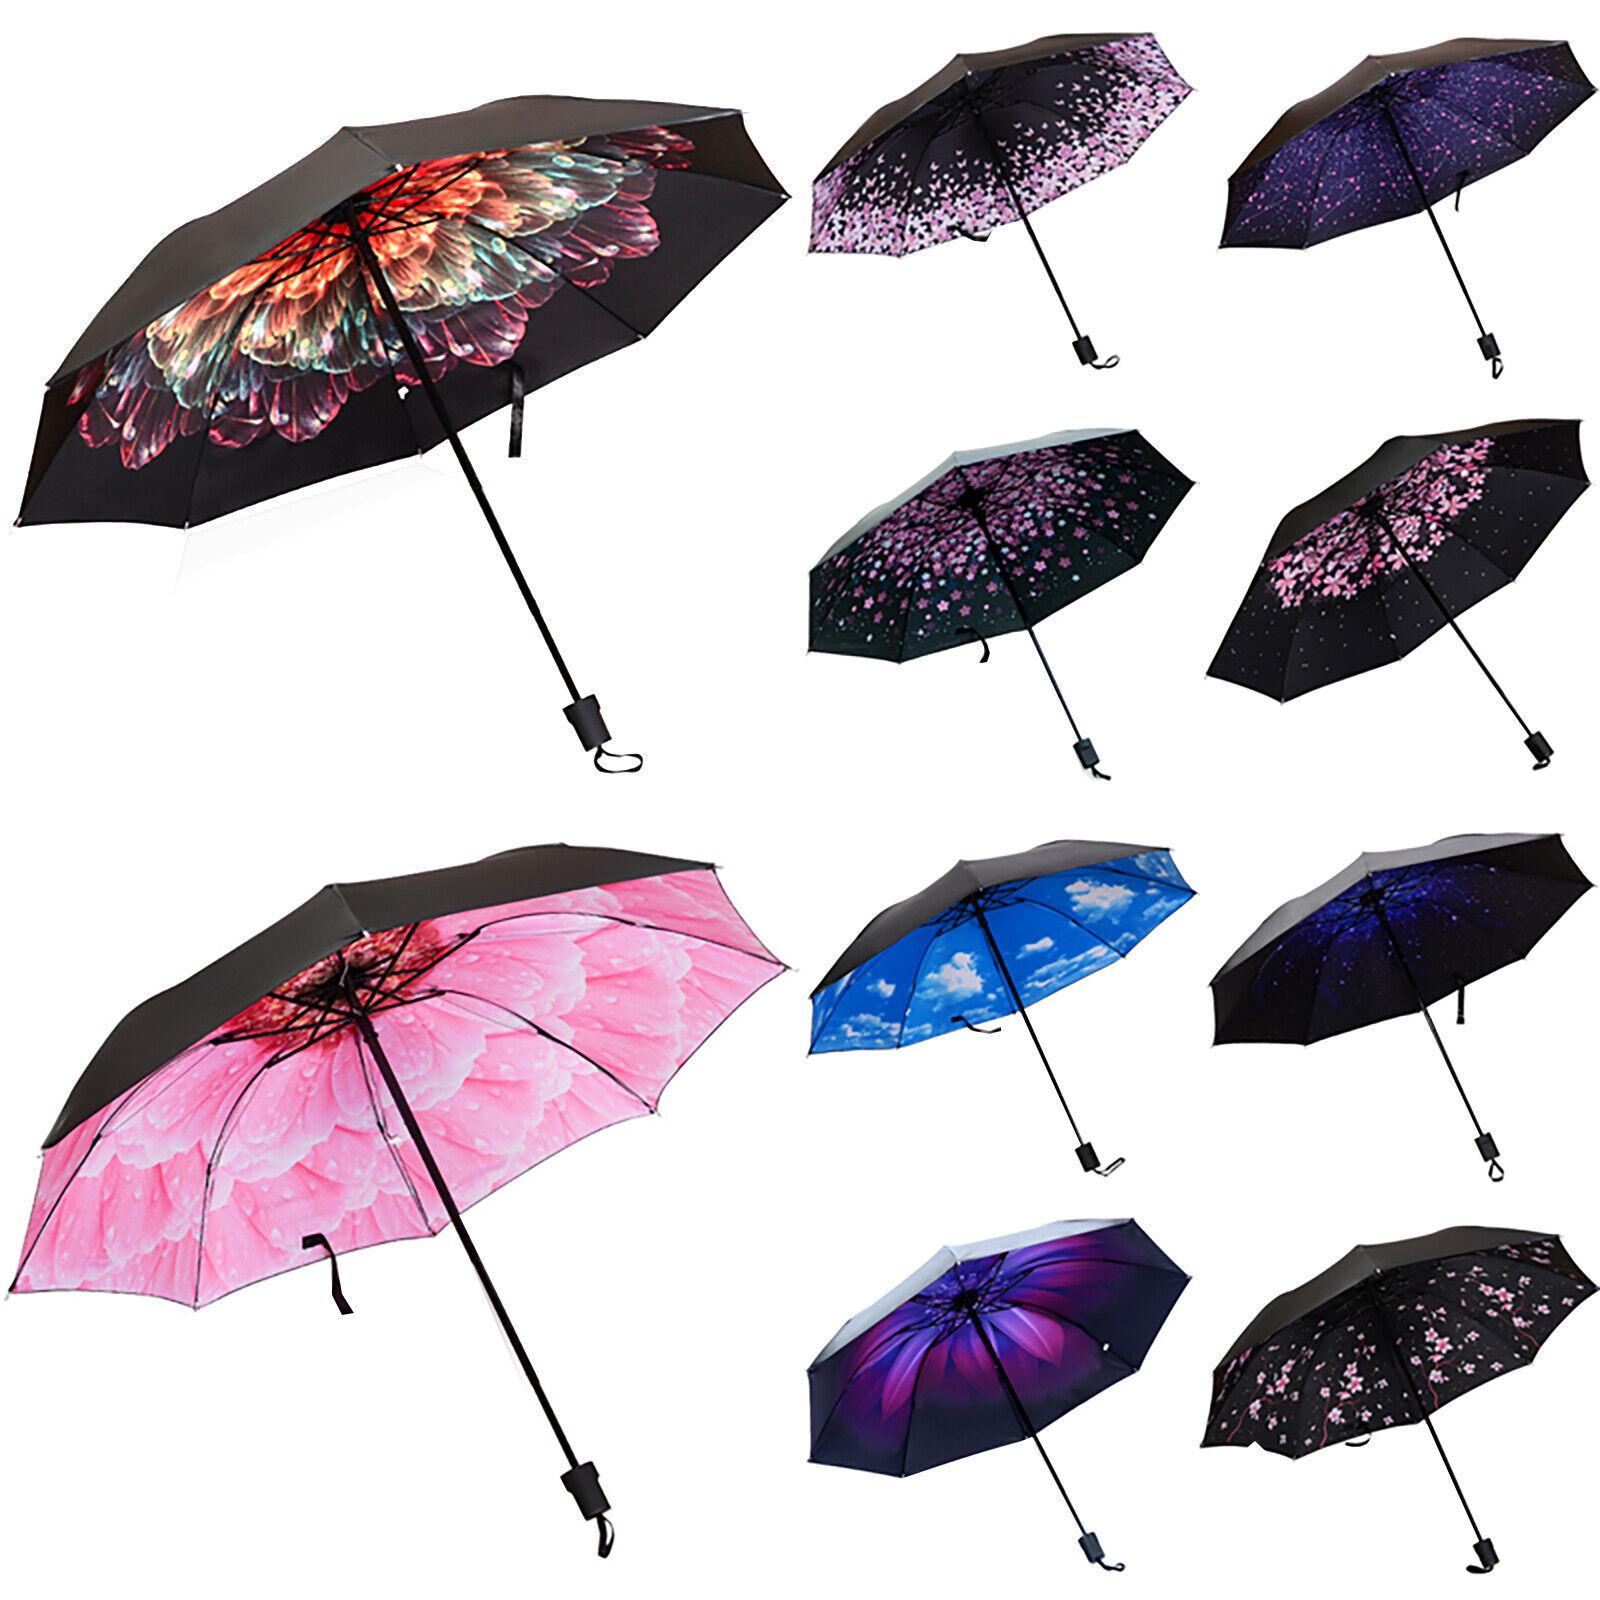 Double Layer Anti UV Upside Down Folding Handle Reverse Sun Rain Umbrella Floral